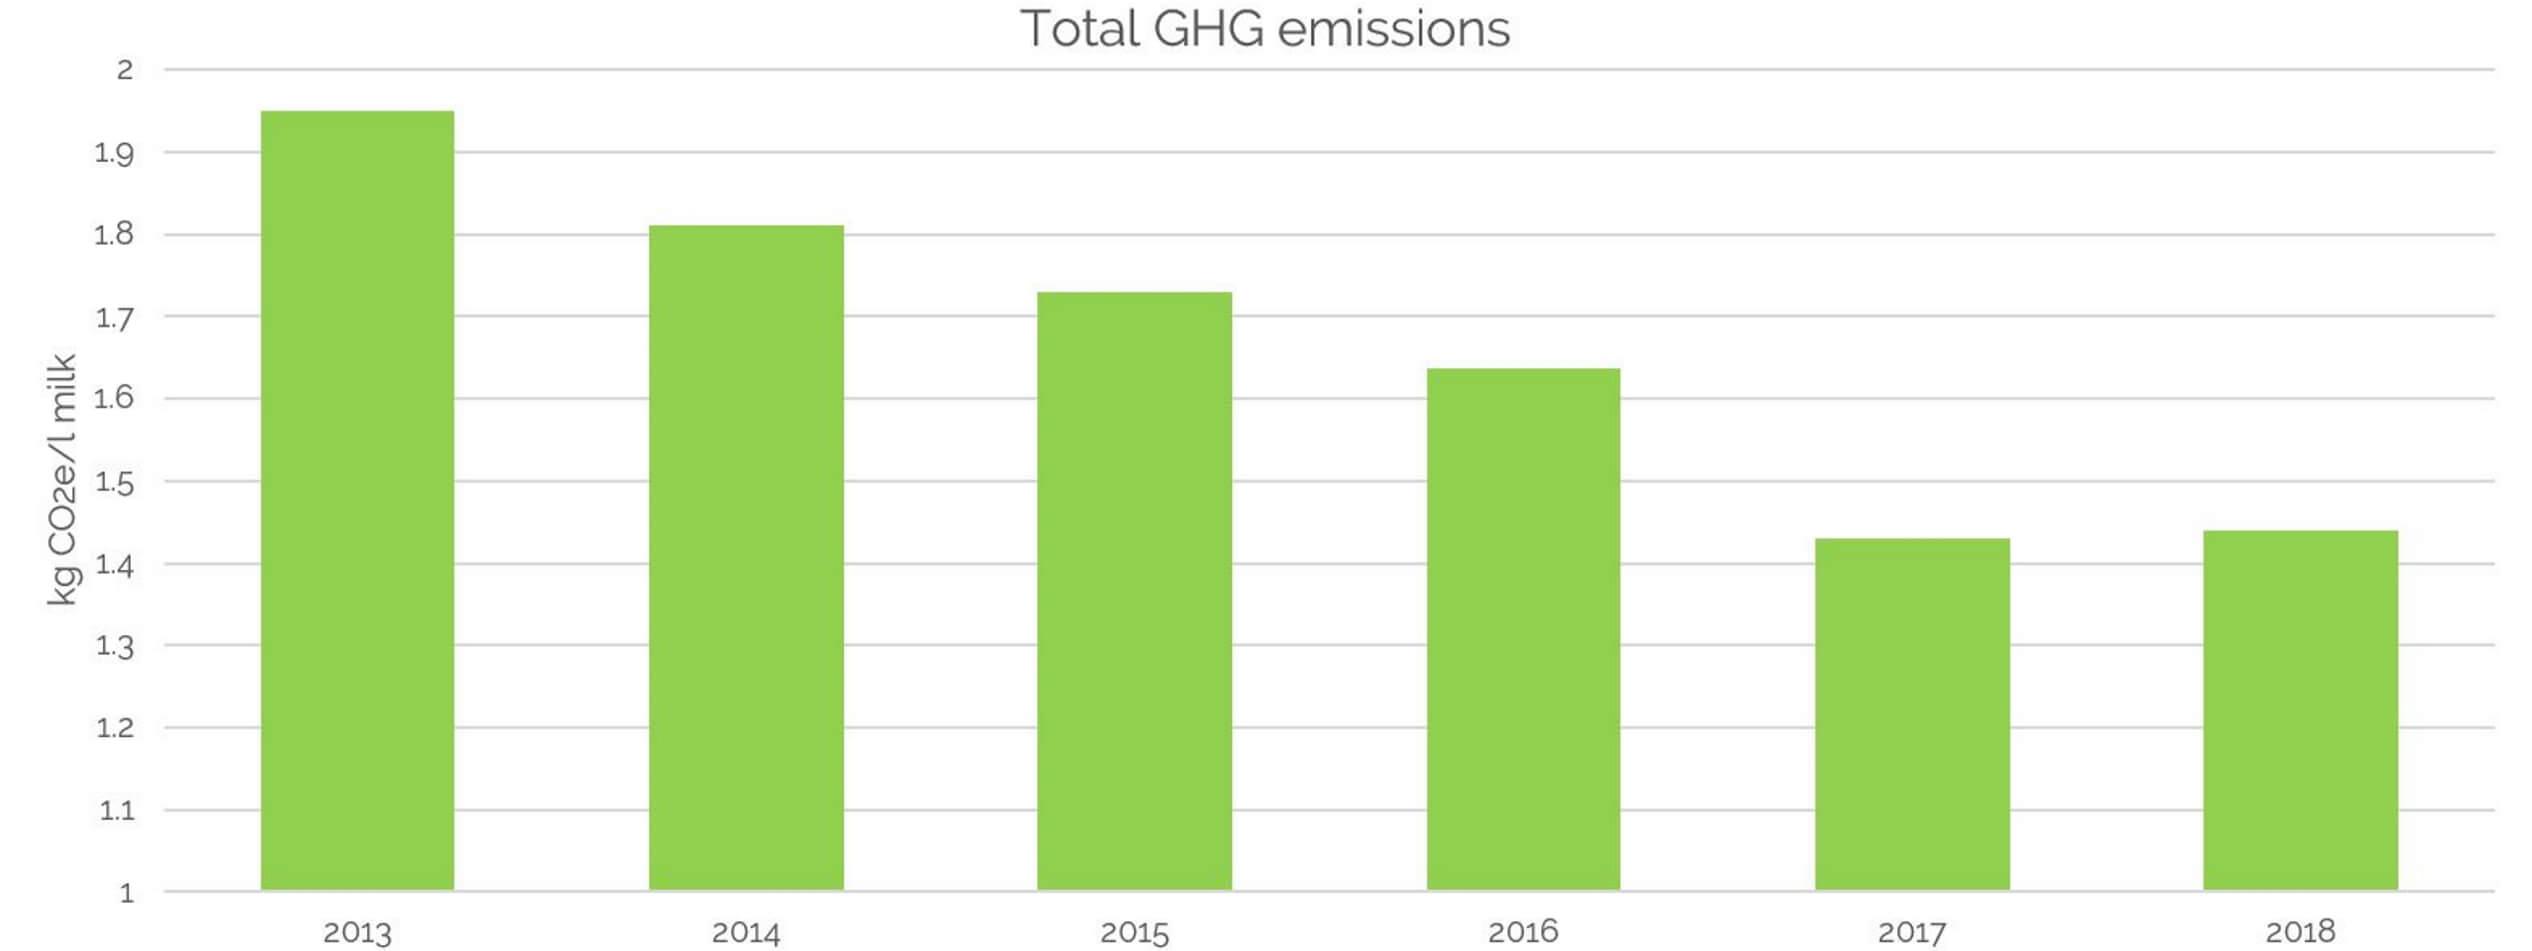 Carbon footprint change 2013-2018 graph